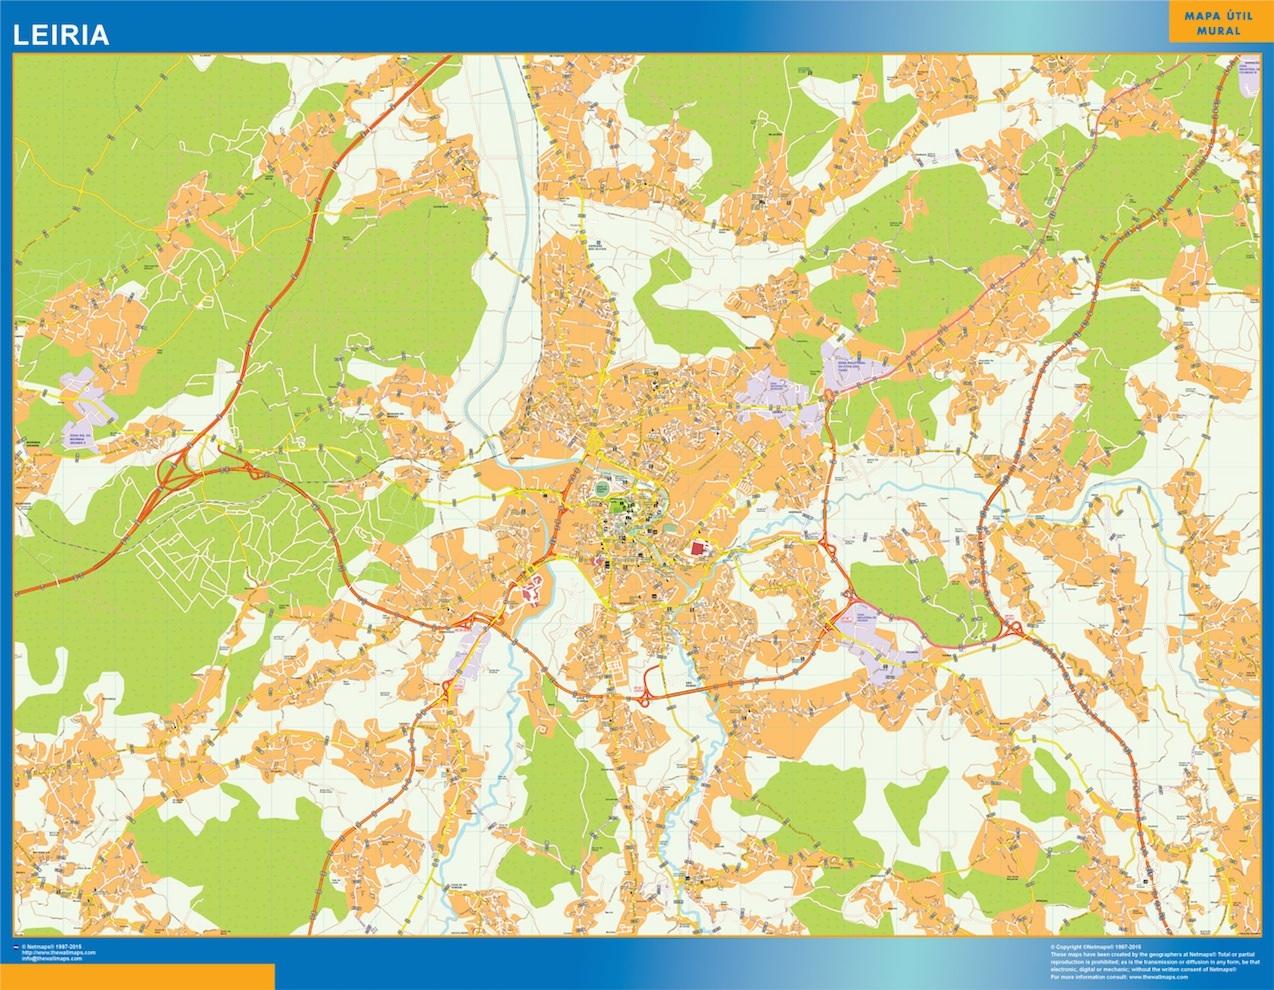 Mapa Leiria en Portugal plastificado gigante